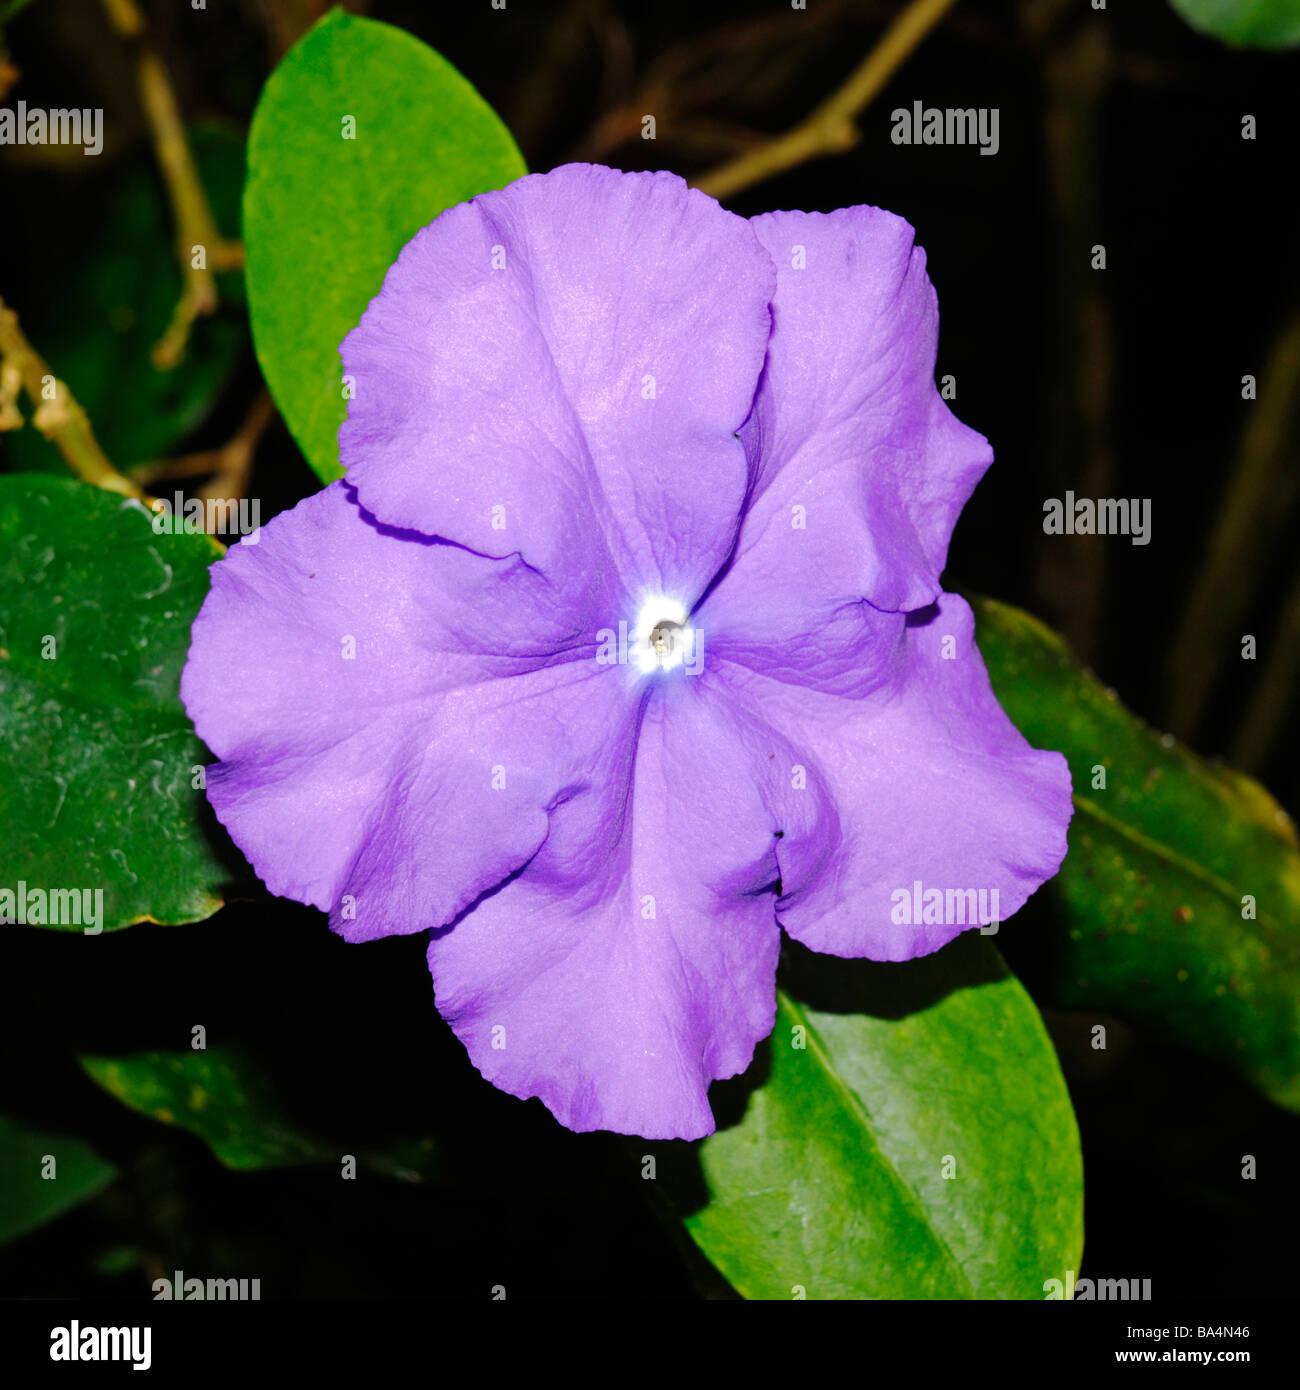 Brunfelsia pauciflora 'Macrantha' - Stock Image